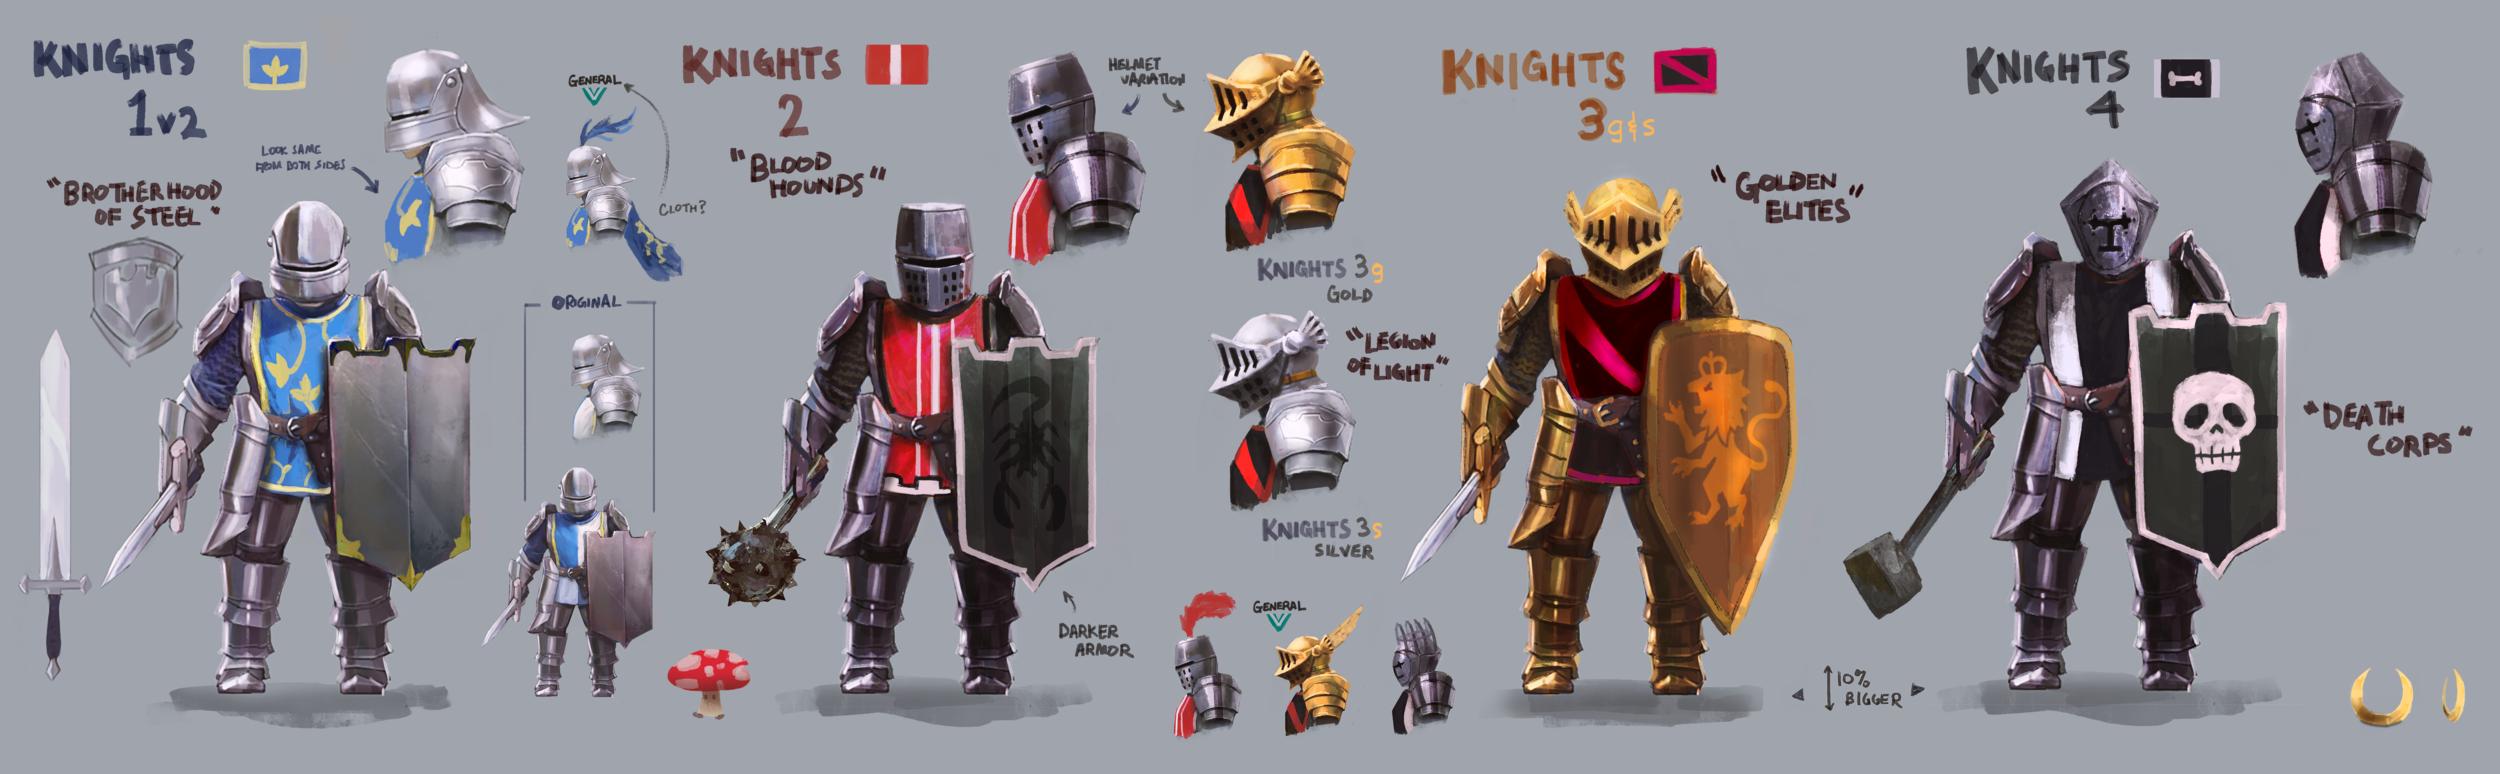 knights_legions.png